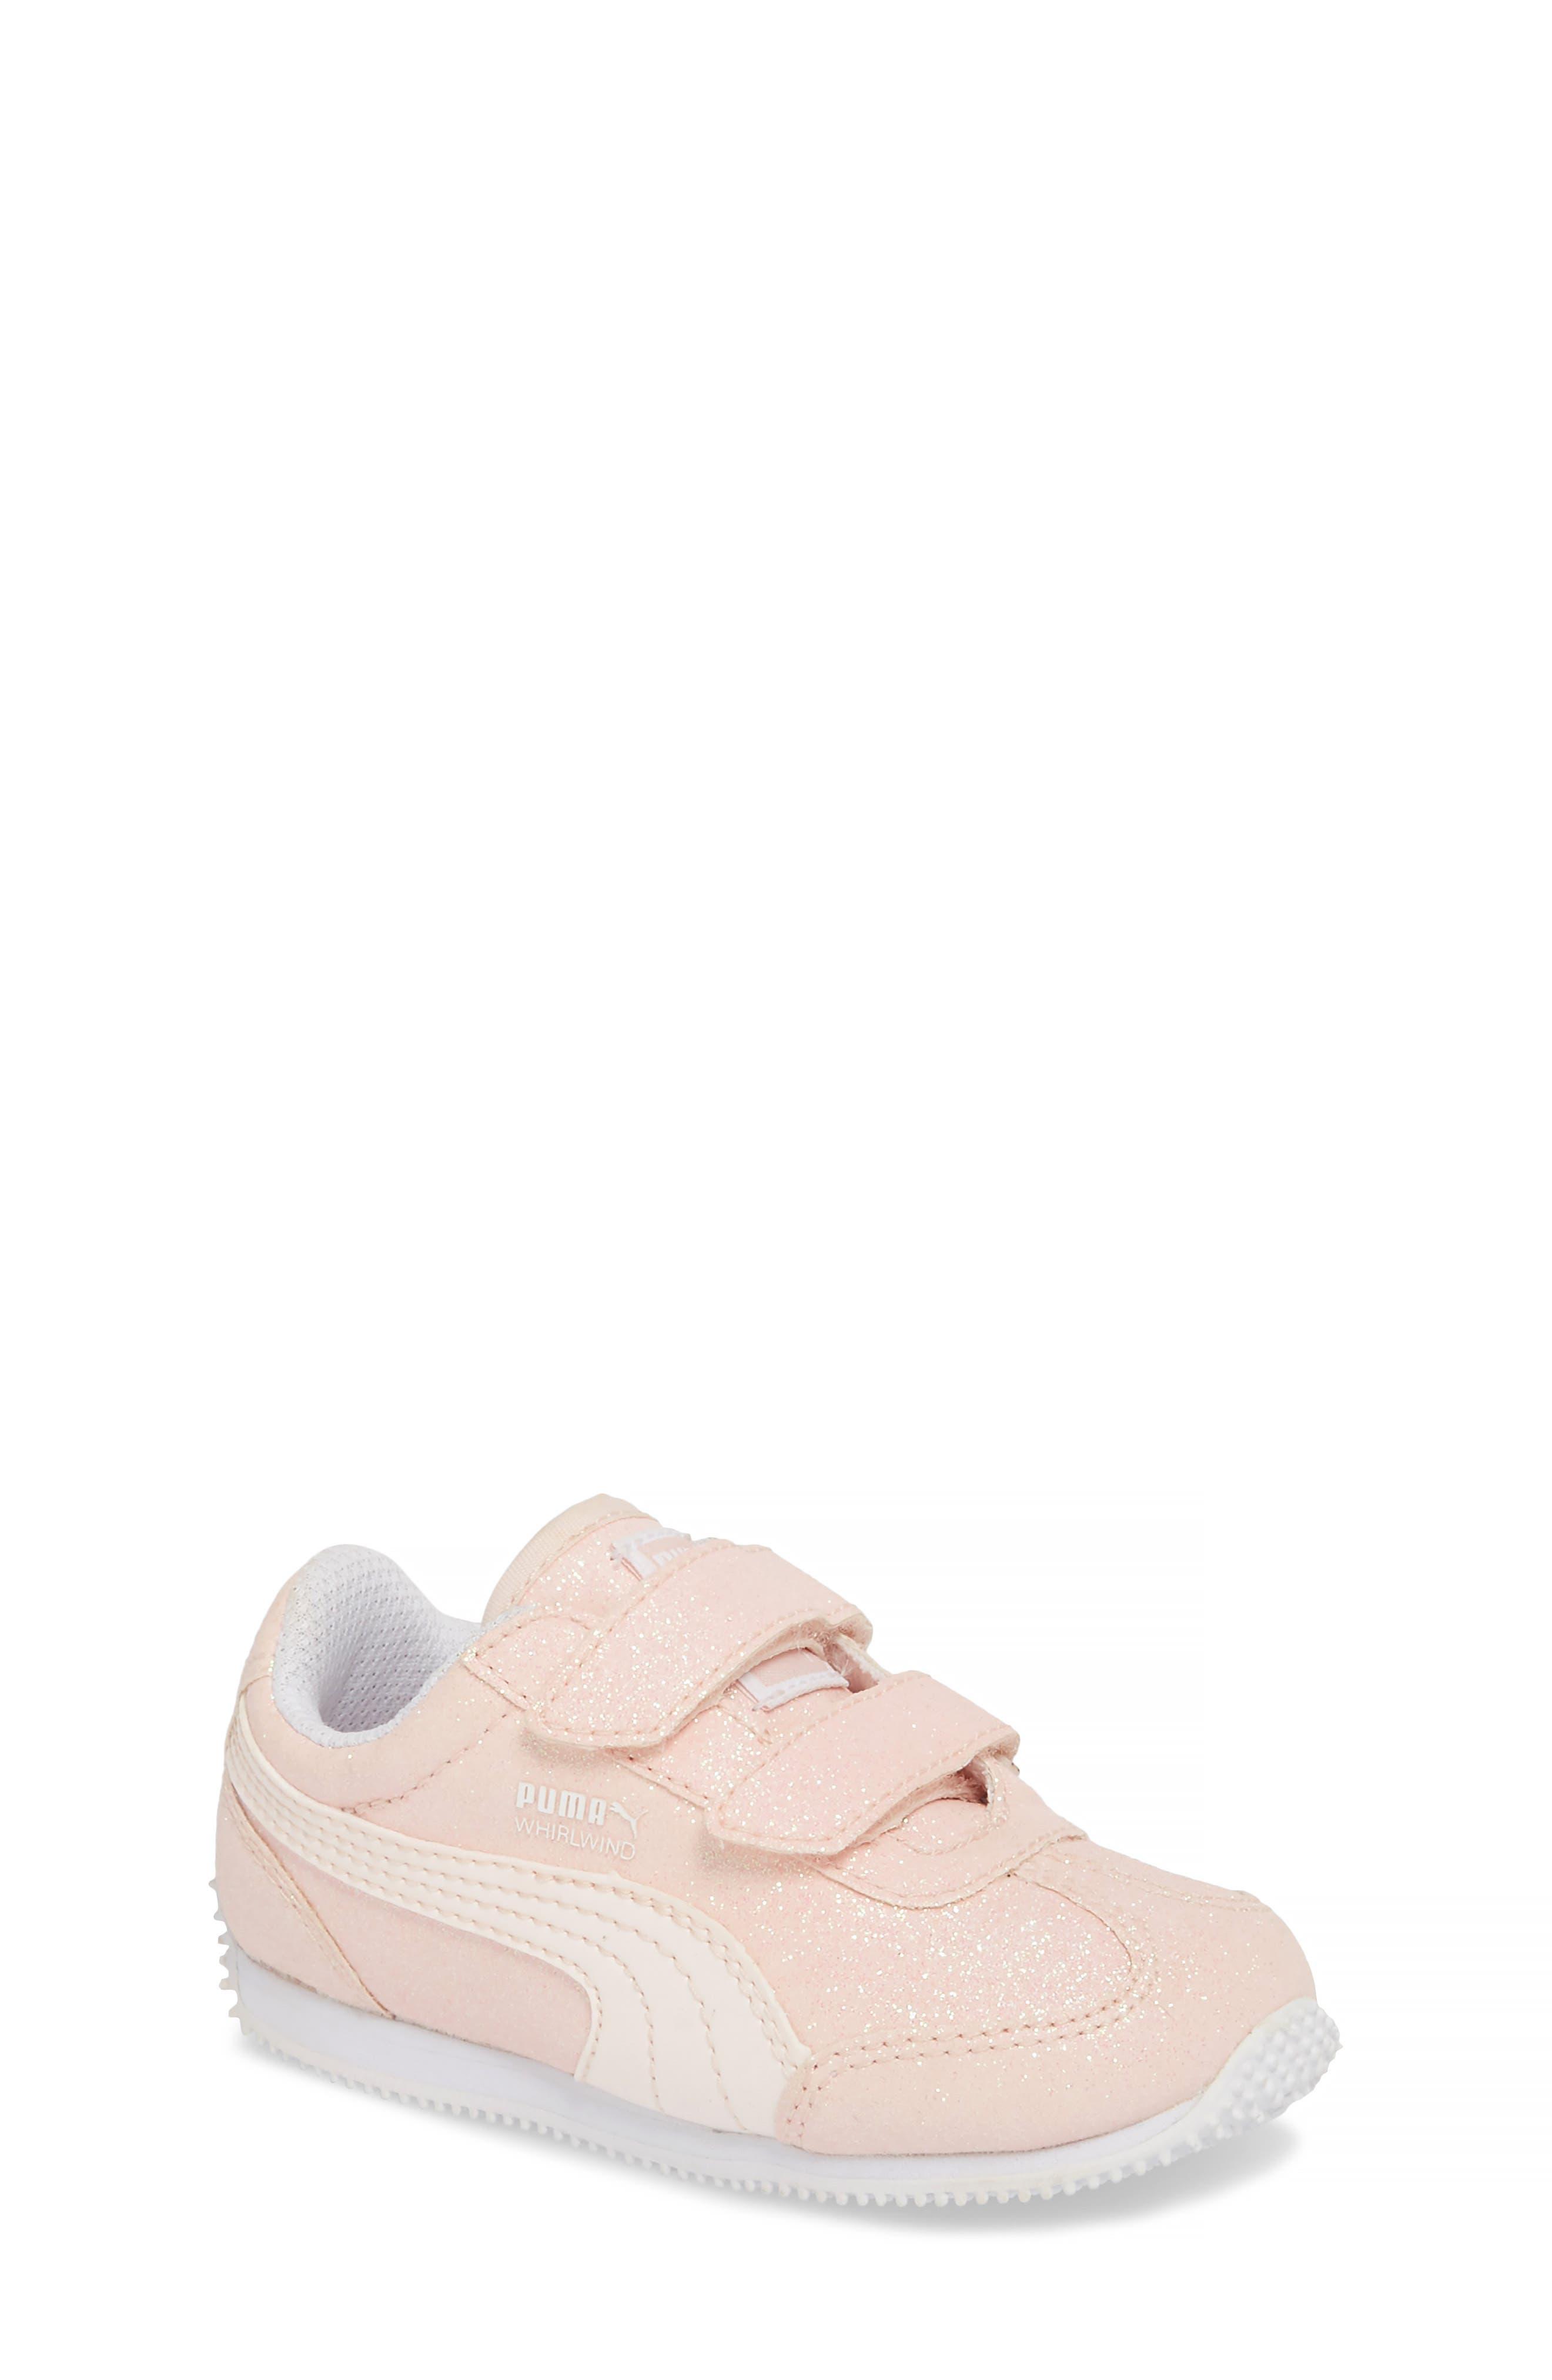 Girls Puma Whirlwind Glitz Sneaker Size 3 M  Pink